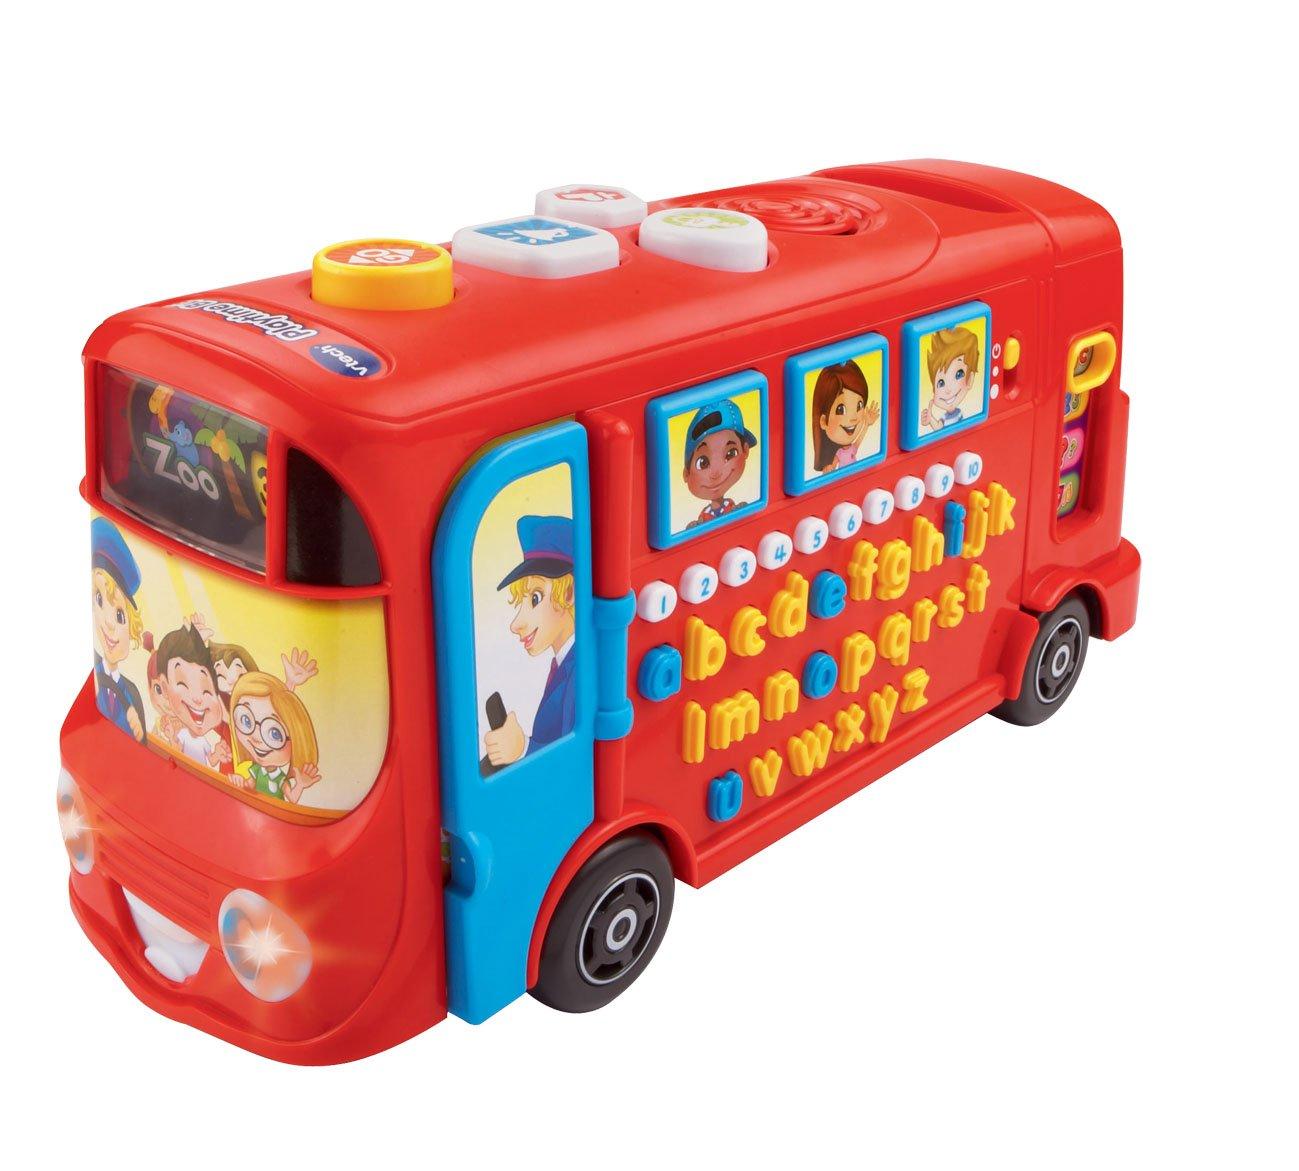 Vtech 150003 Playtime Bus Playset